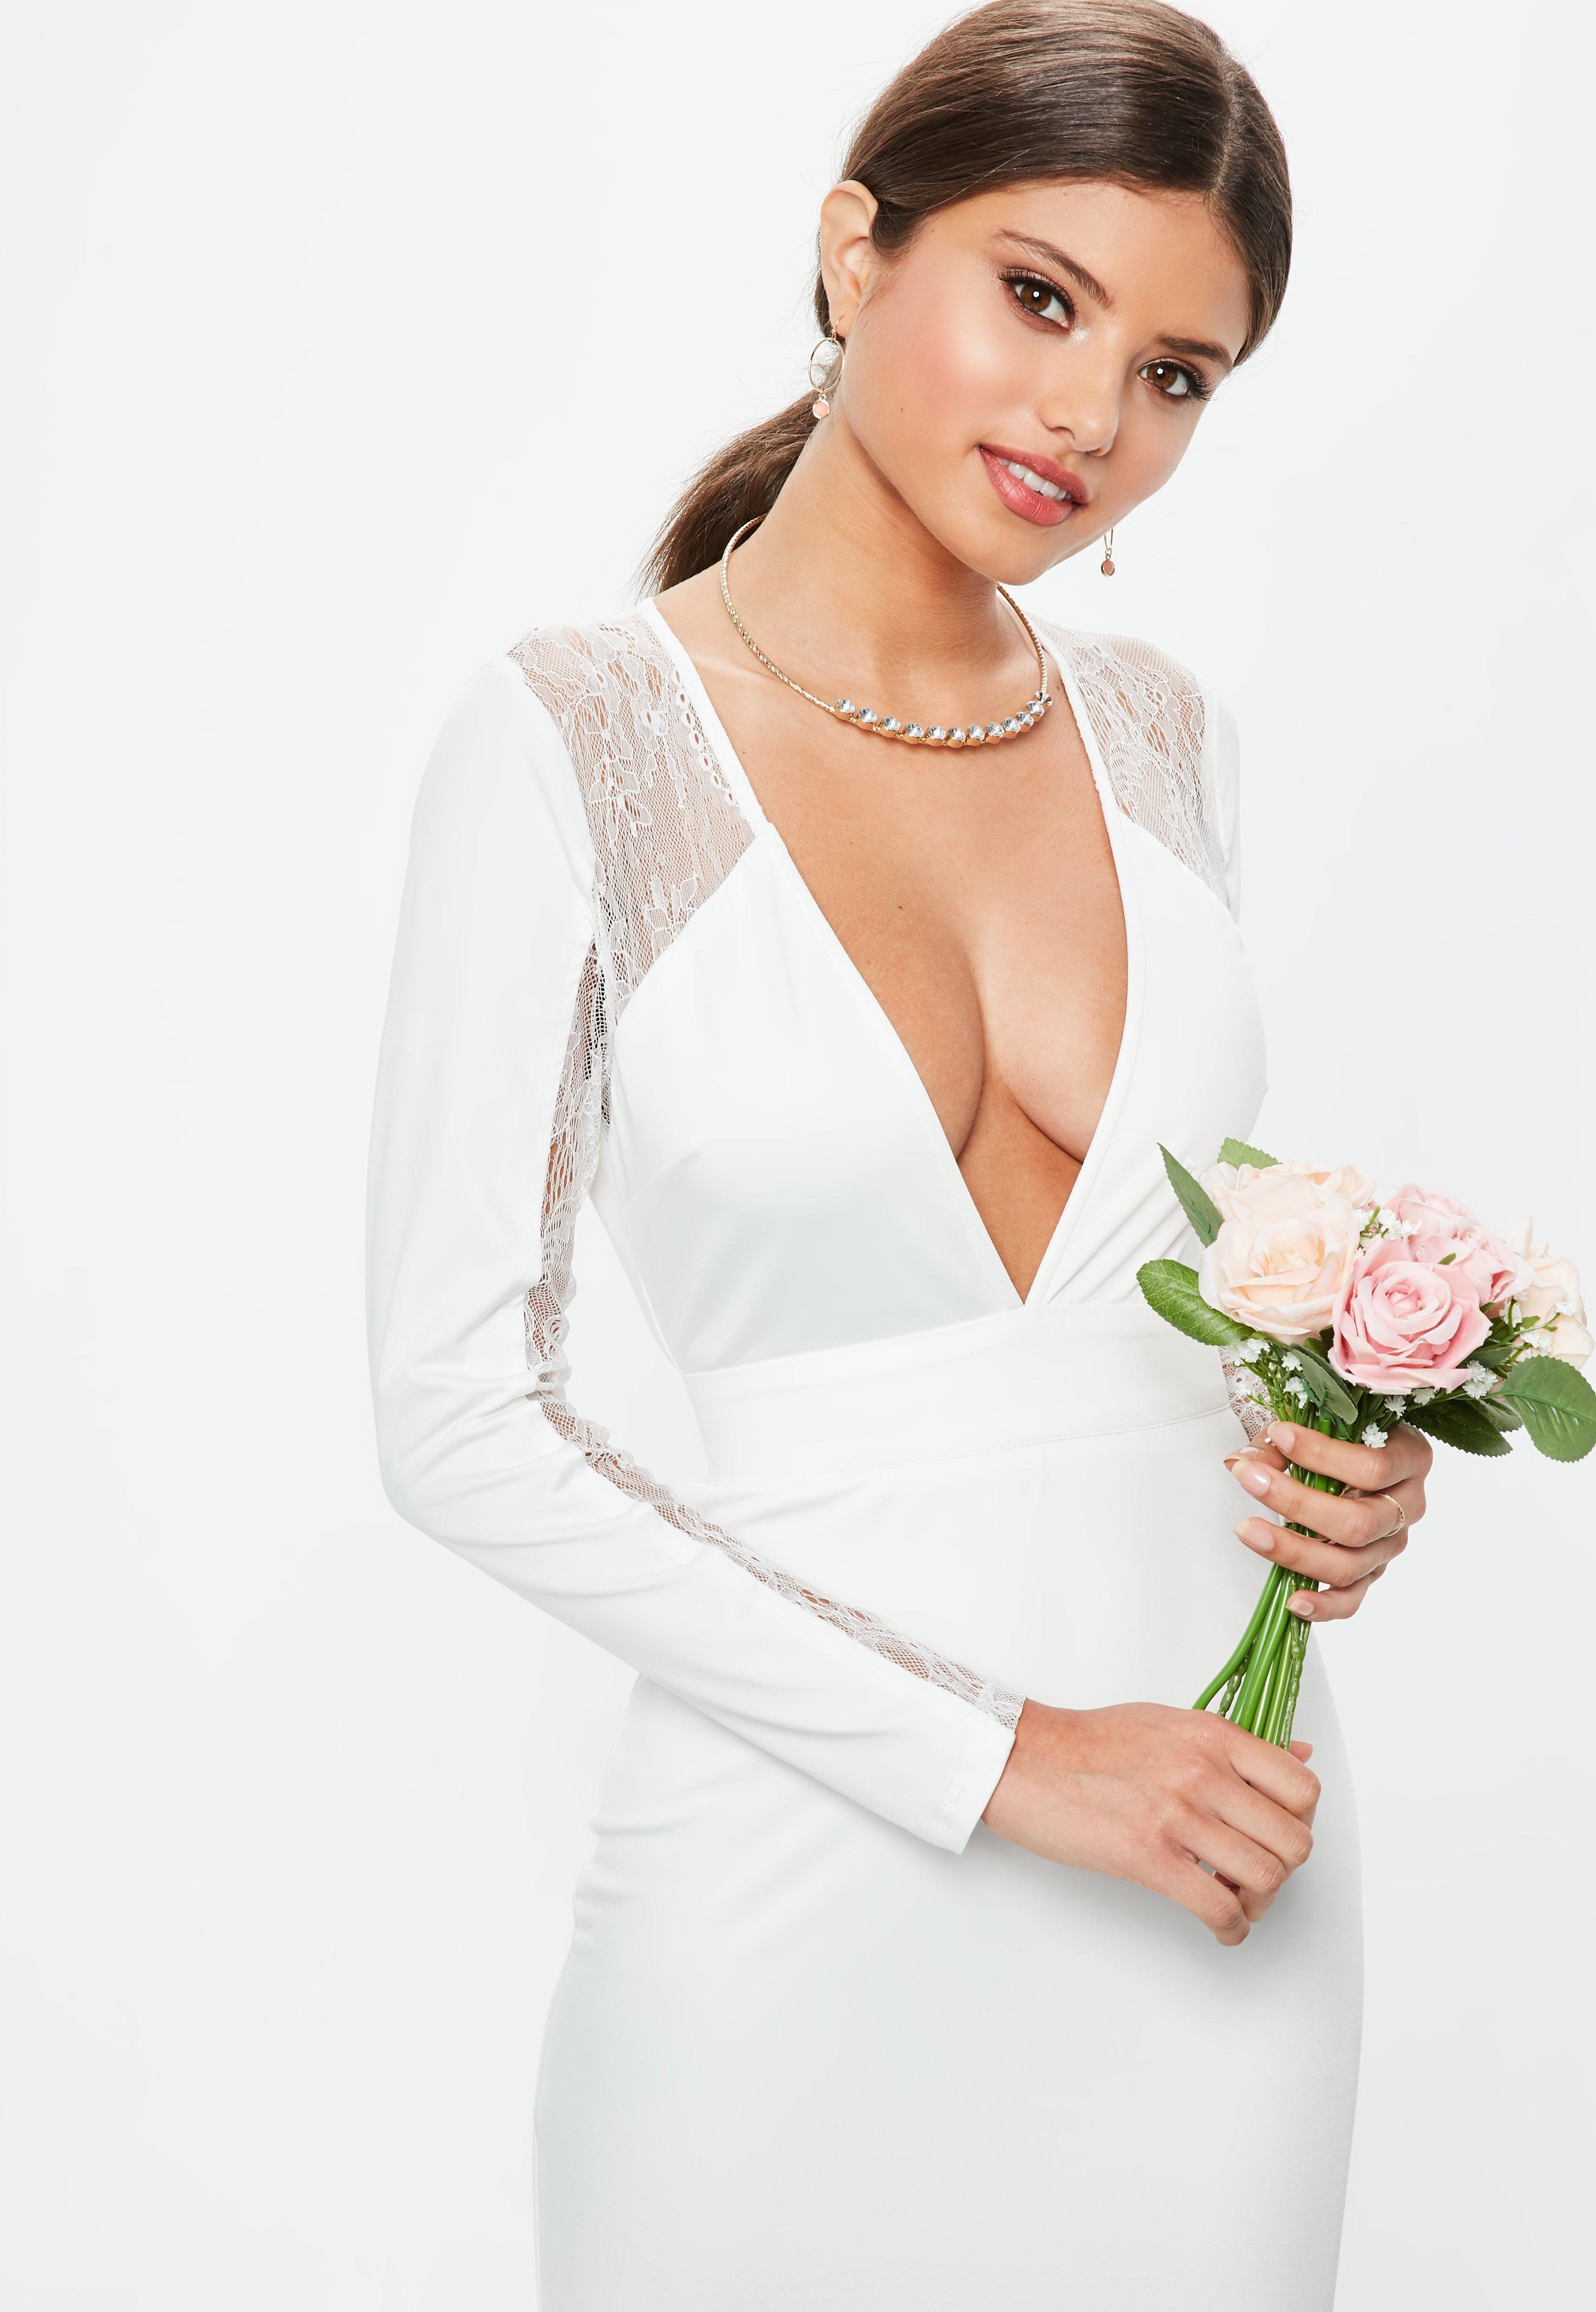 Missbrided Hochzeits-Kollektion   Brautmode - Missguided DE